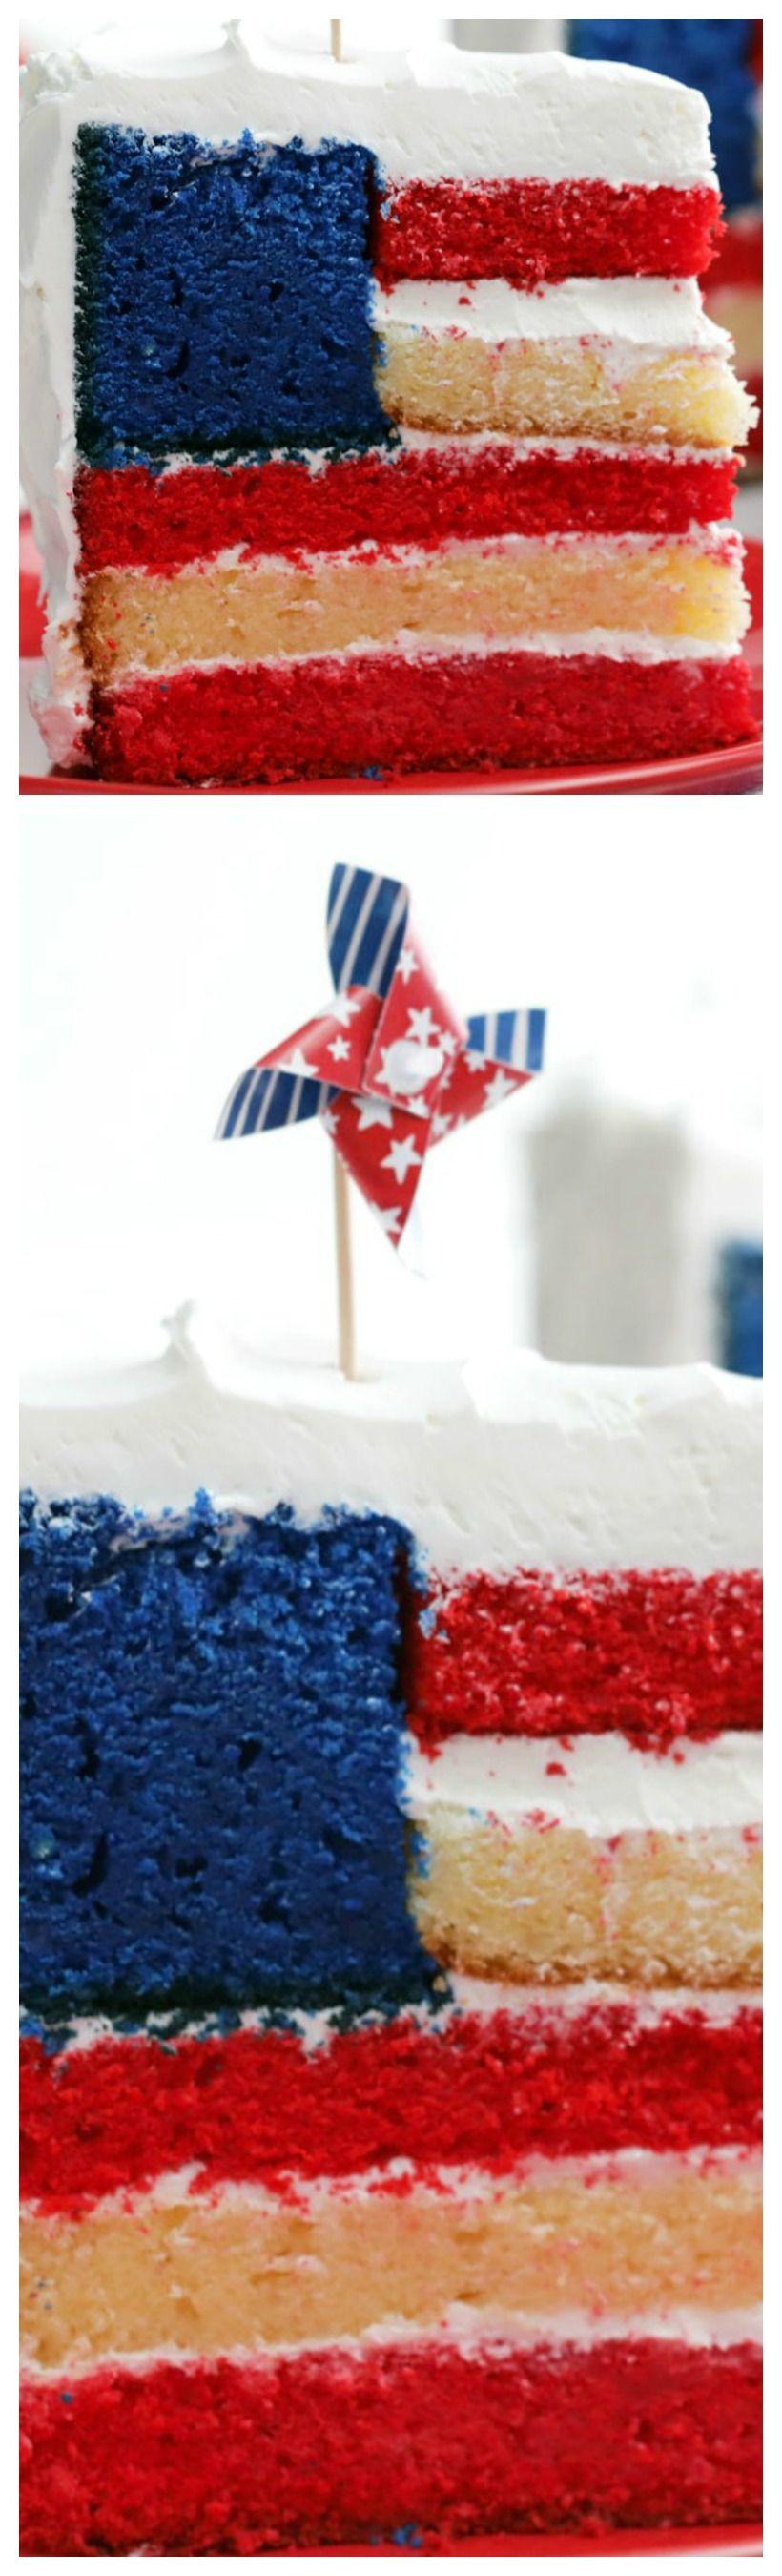 Flag Cake Recipe In 2020 Flag Cake Cake Flag Cake Recipe